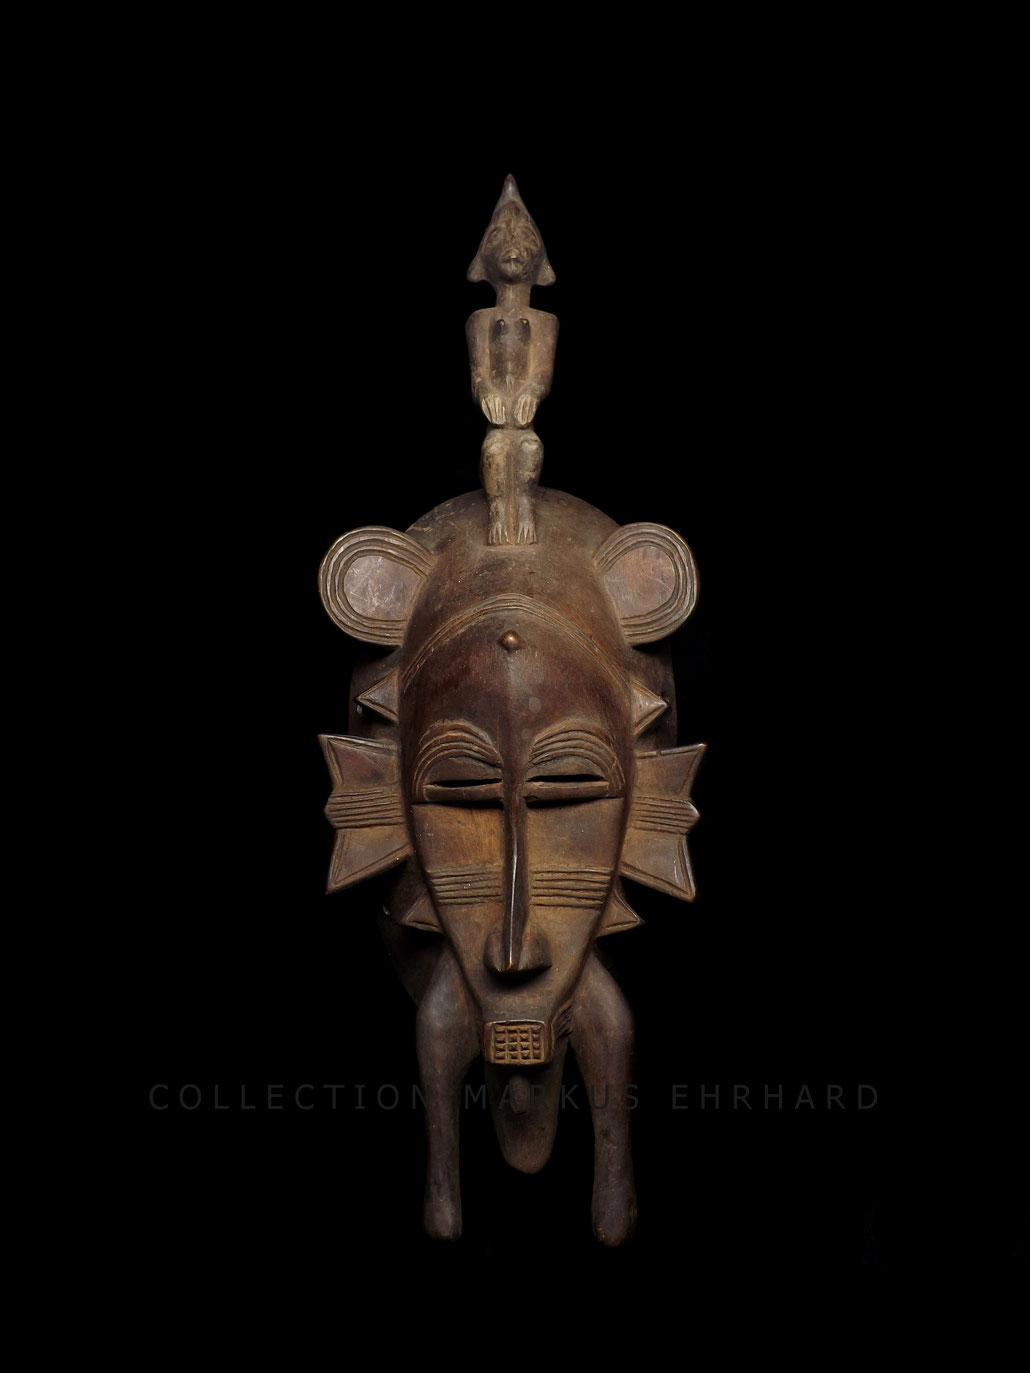 Kpelié mask Senufo art, Senoufo masque Zanga Konaté